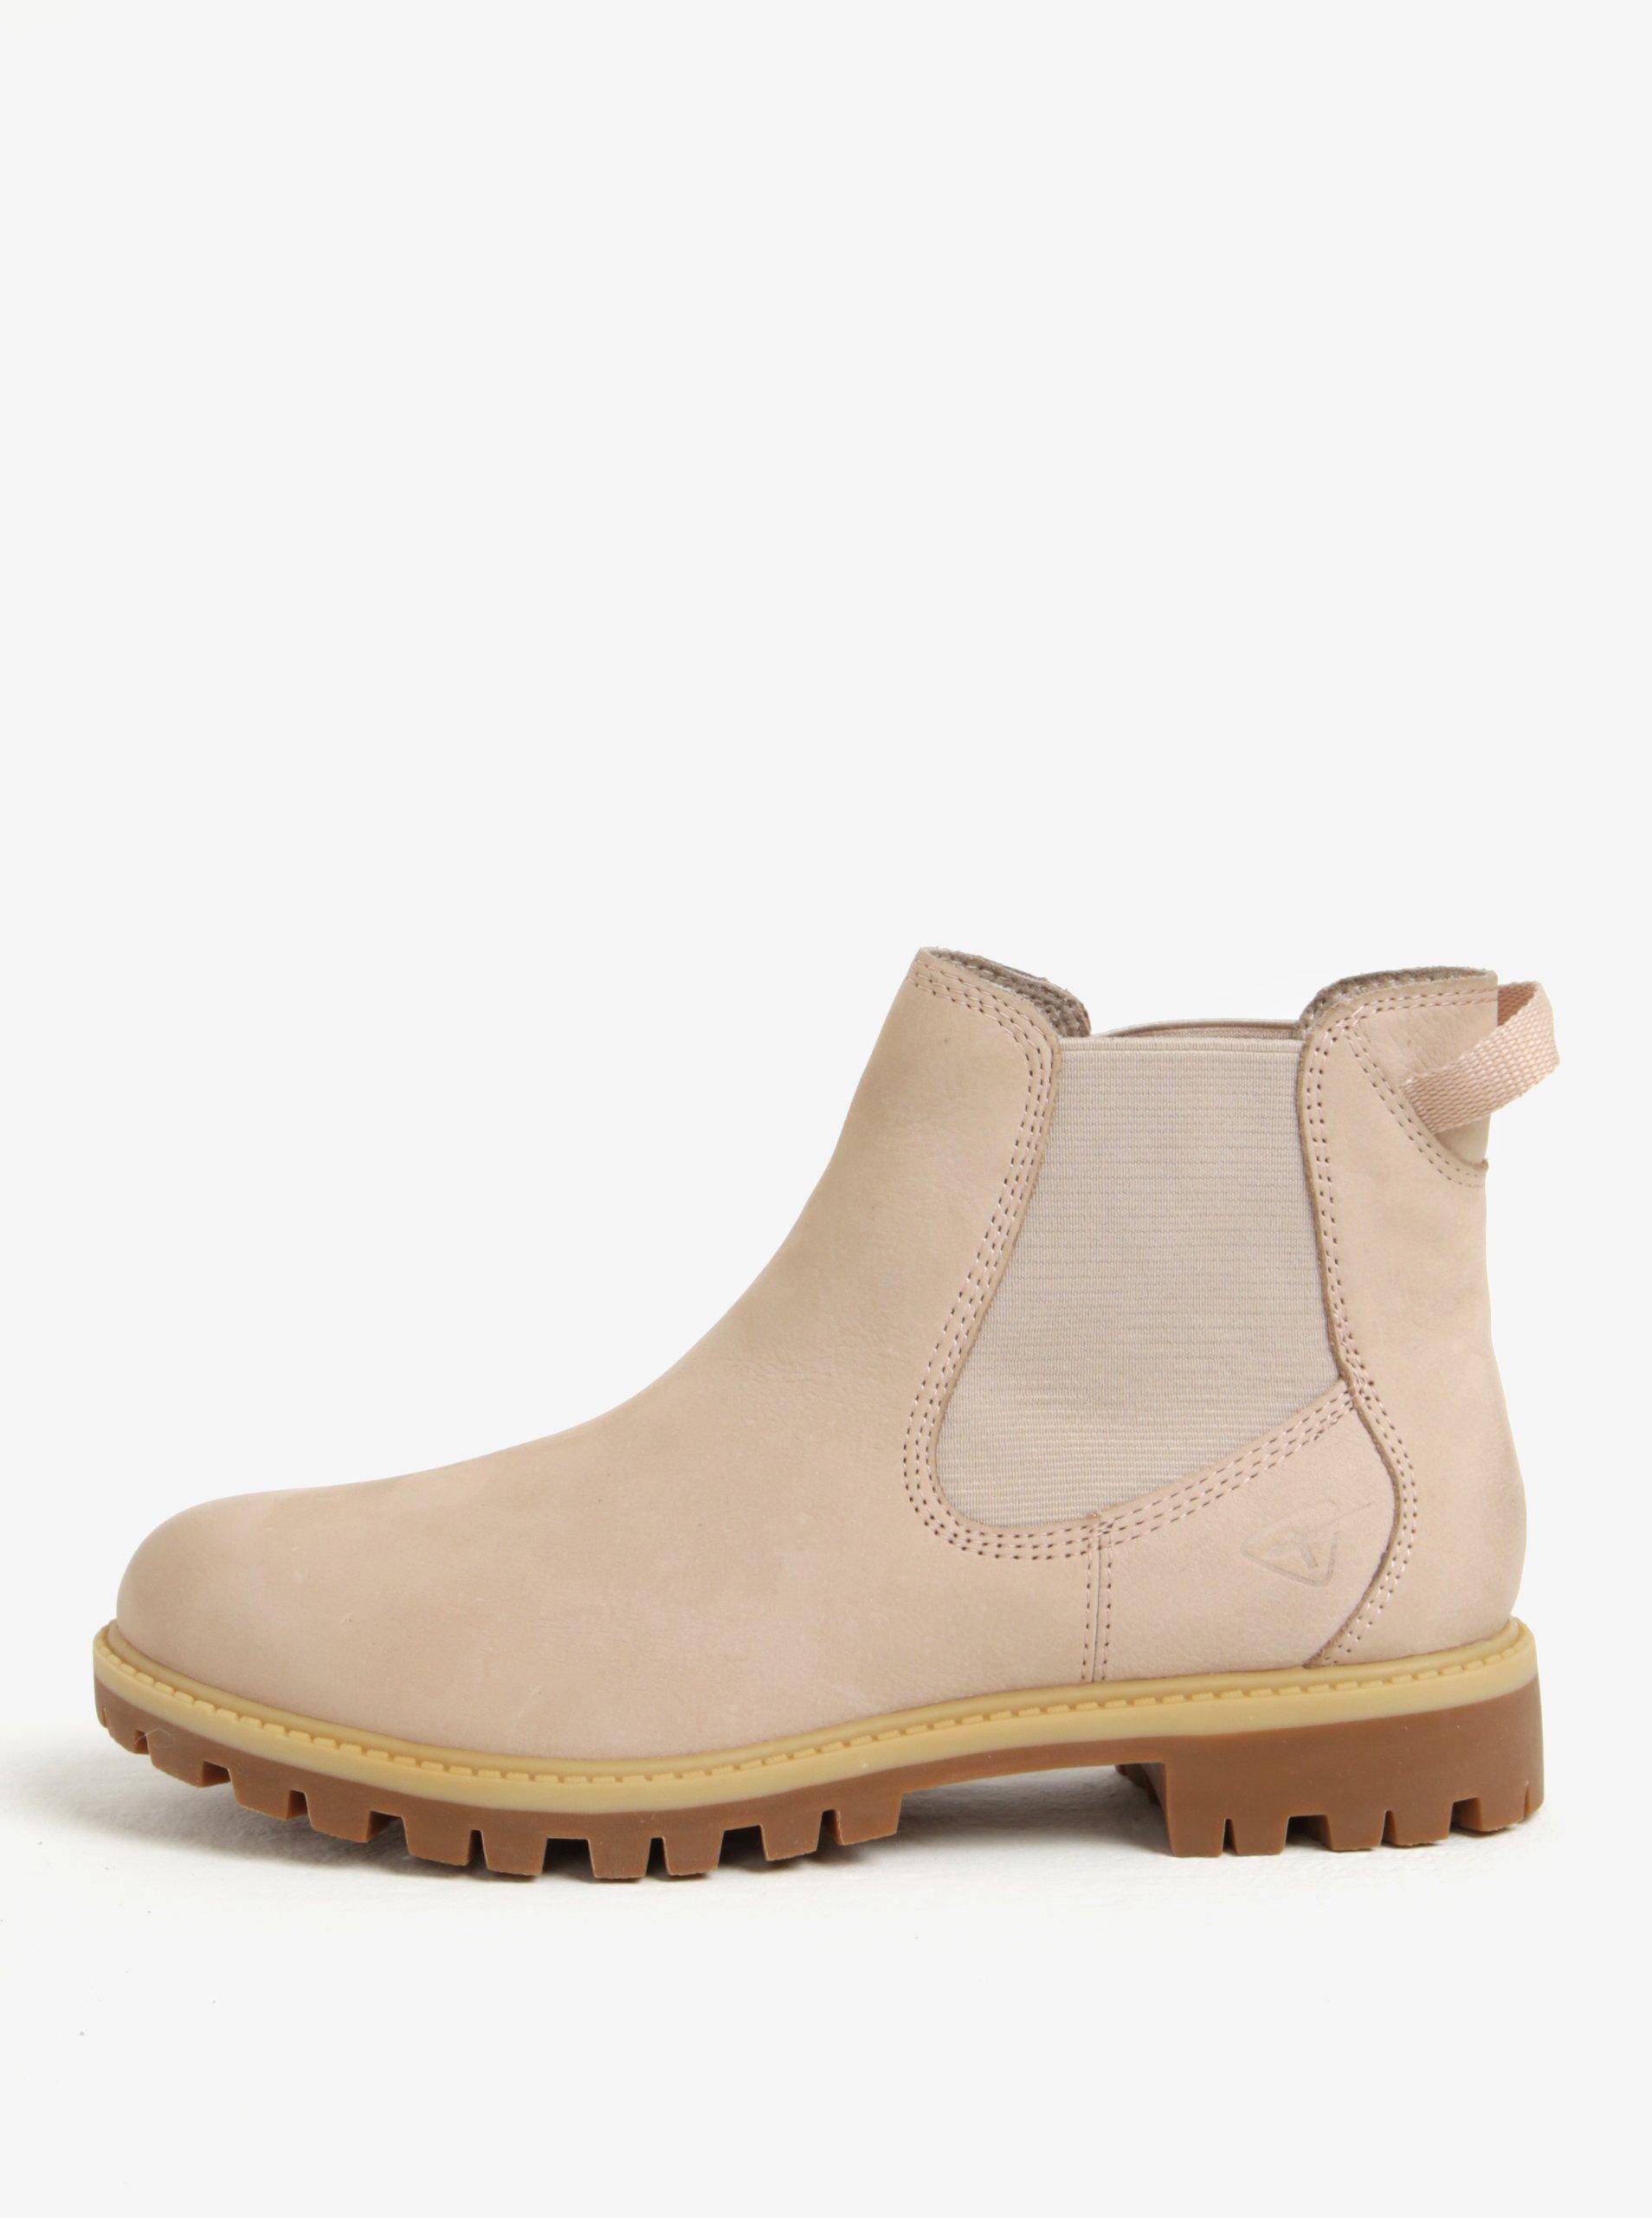 70ed6cbe373c Svetloružové kožené chelsea topánky Tamaris